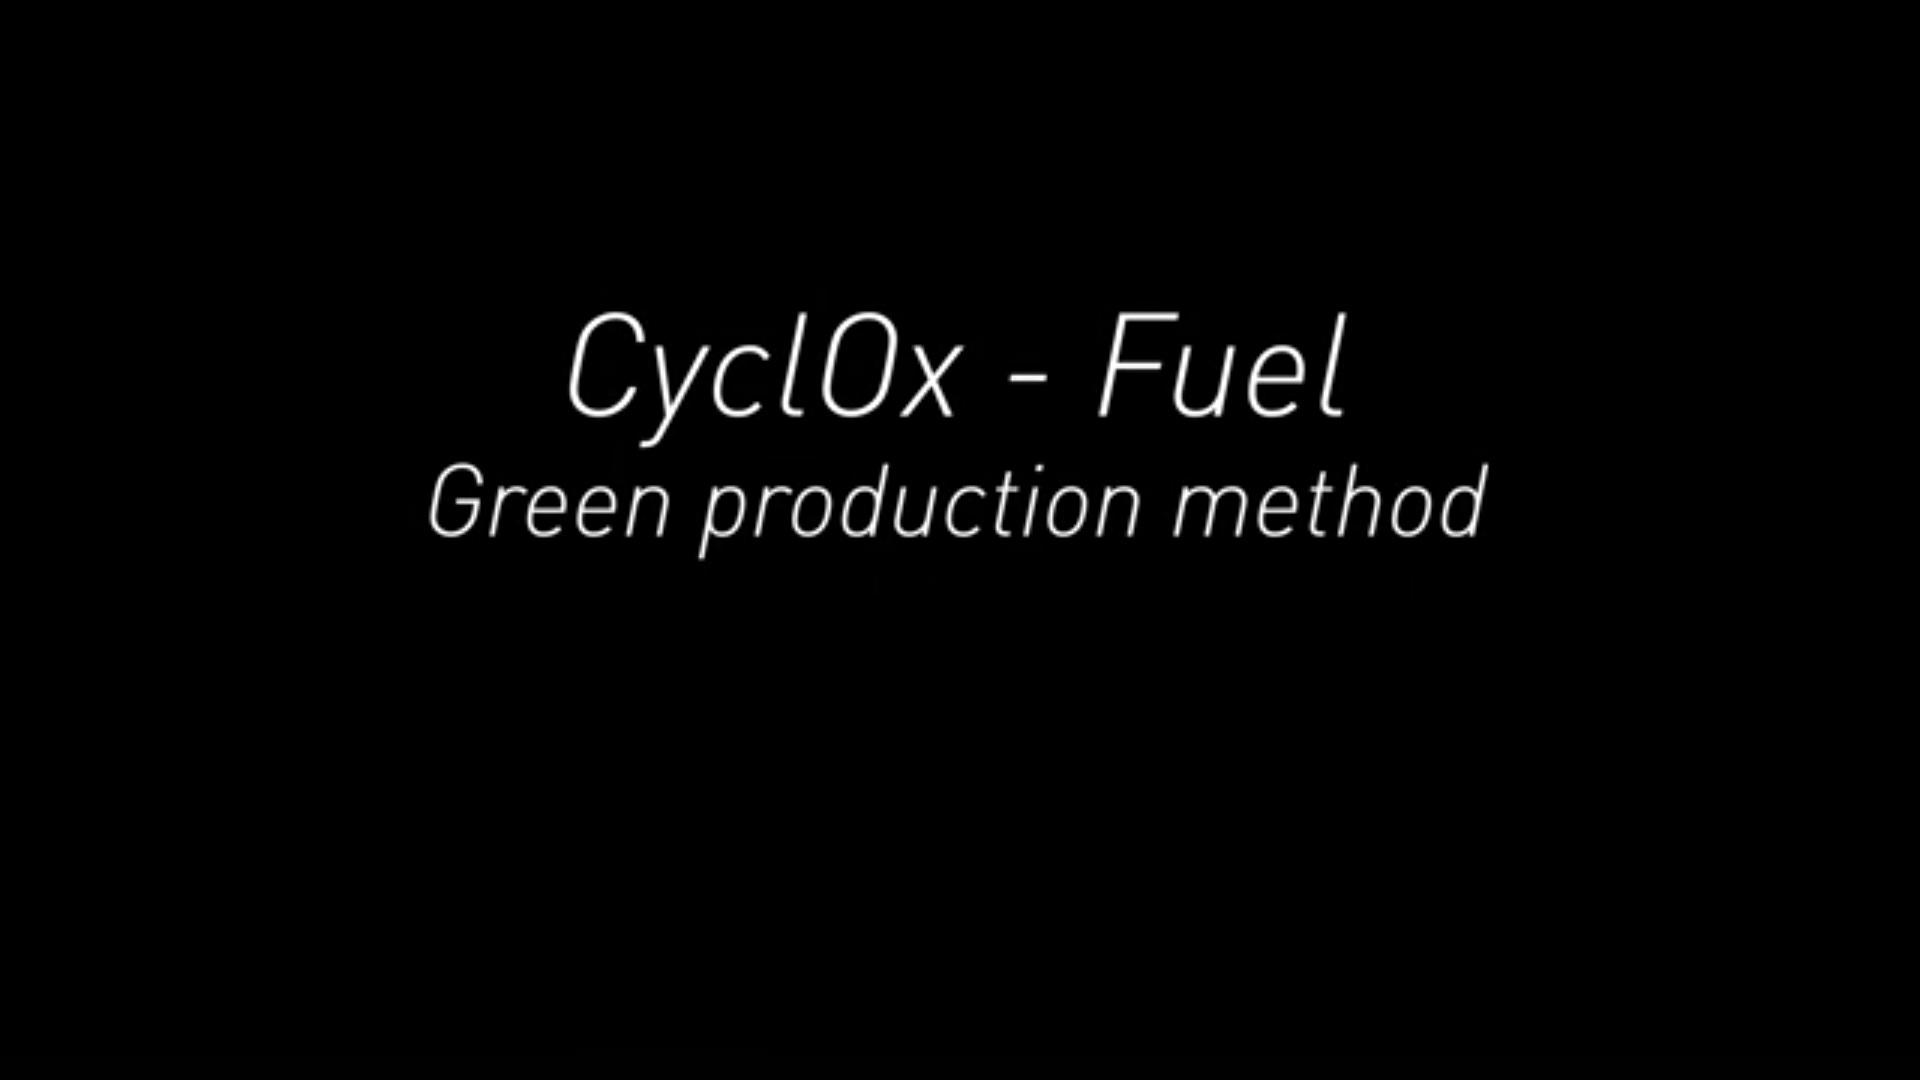 CycLox_Green_Production_Method_start_screen